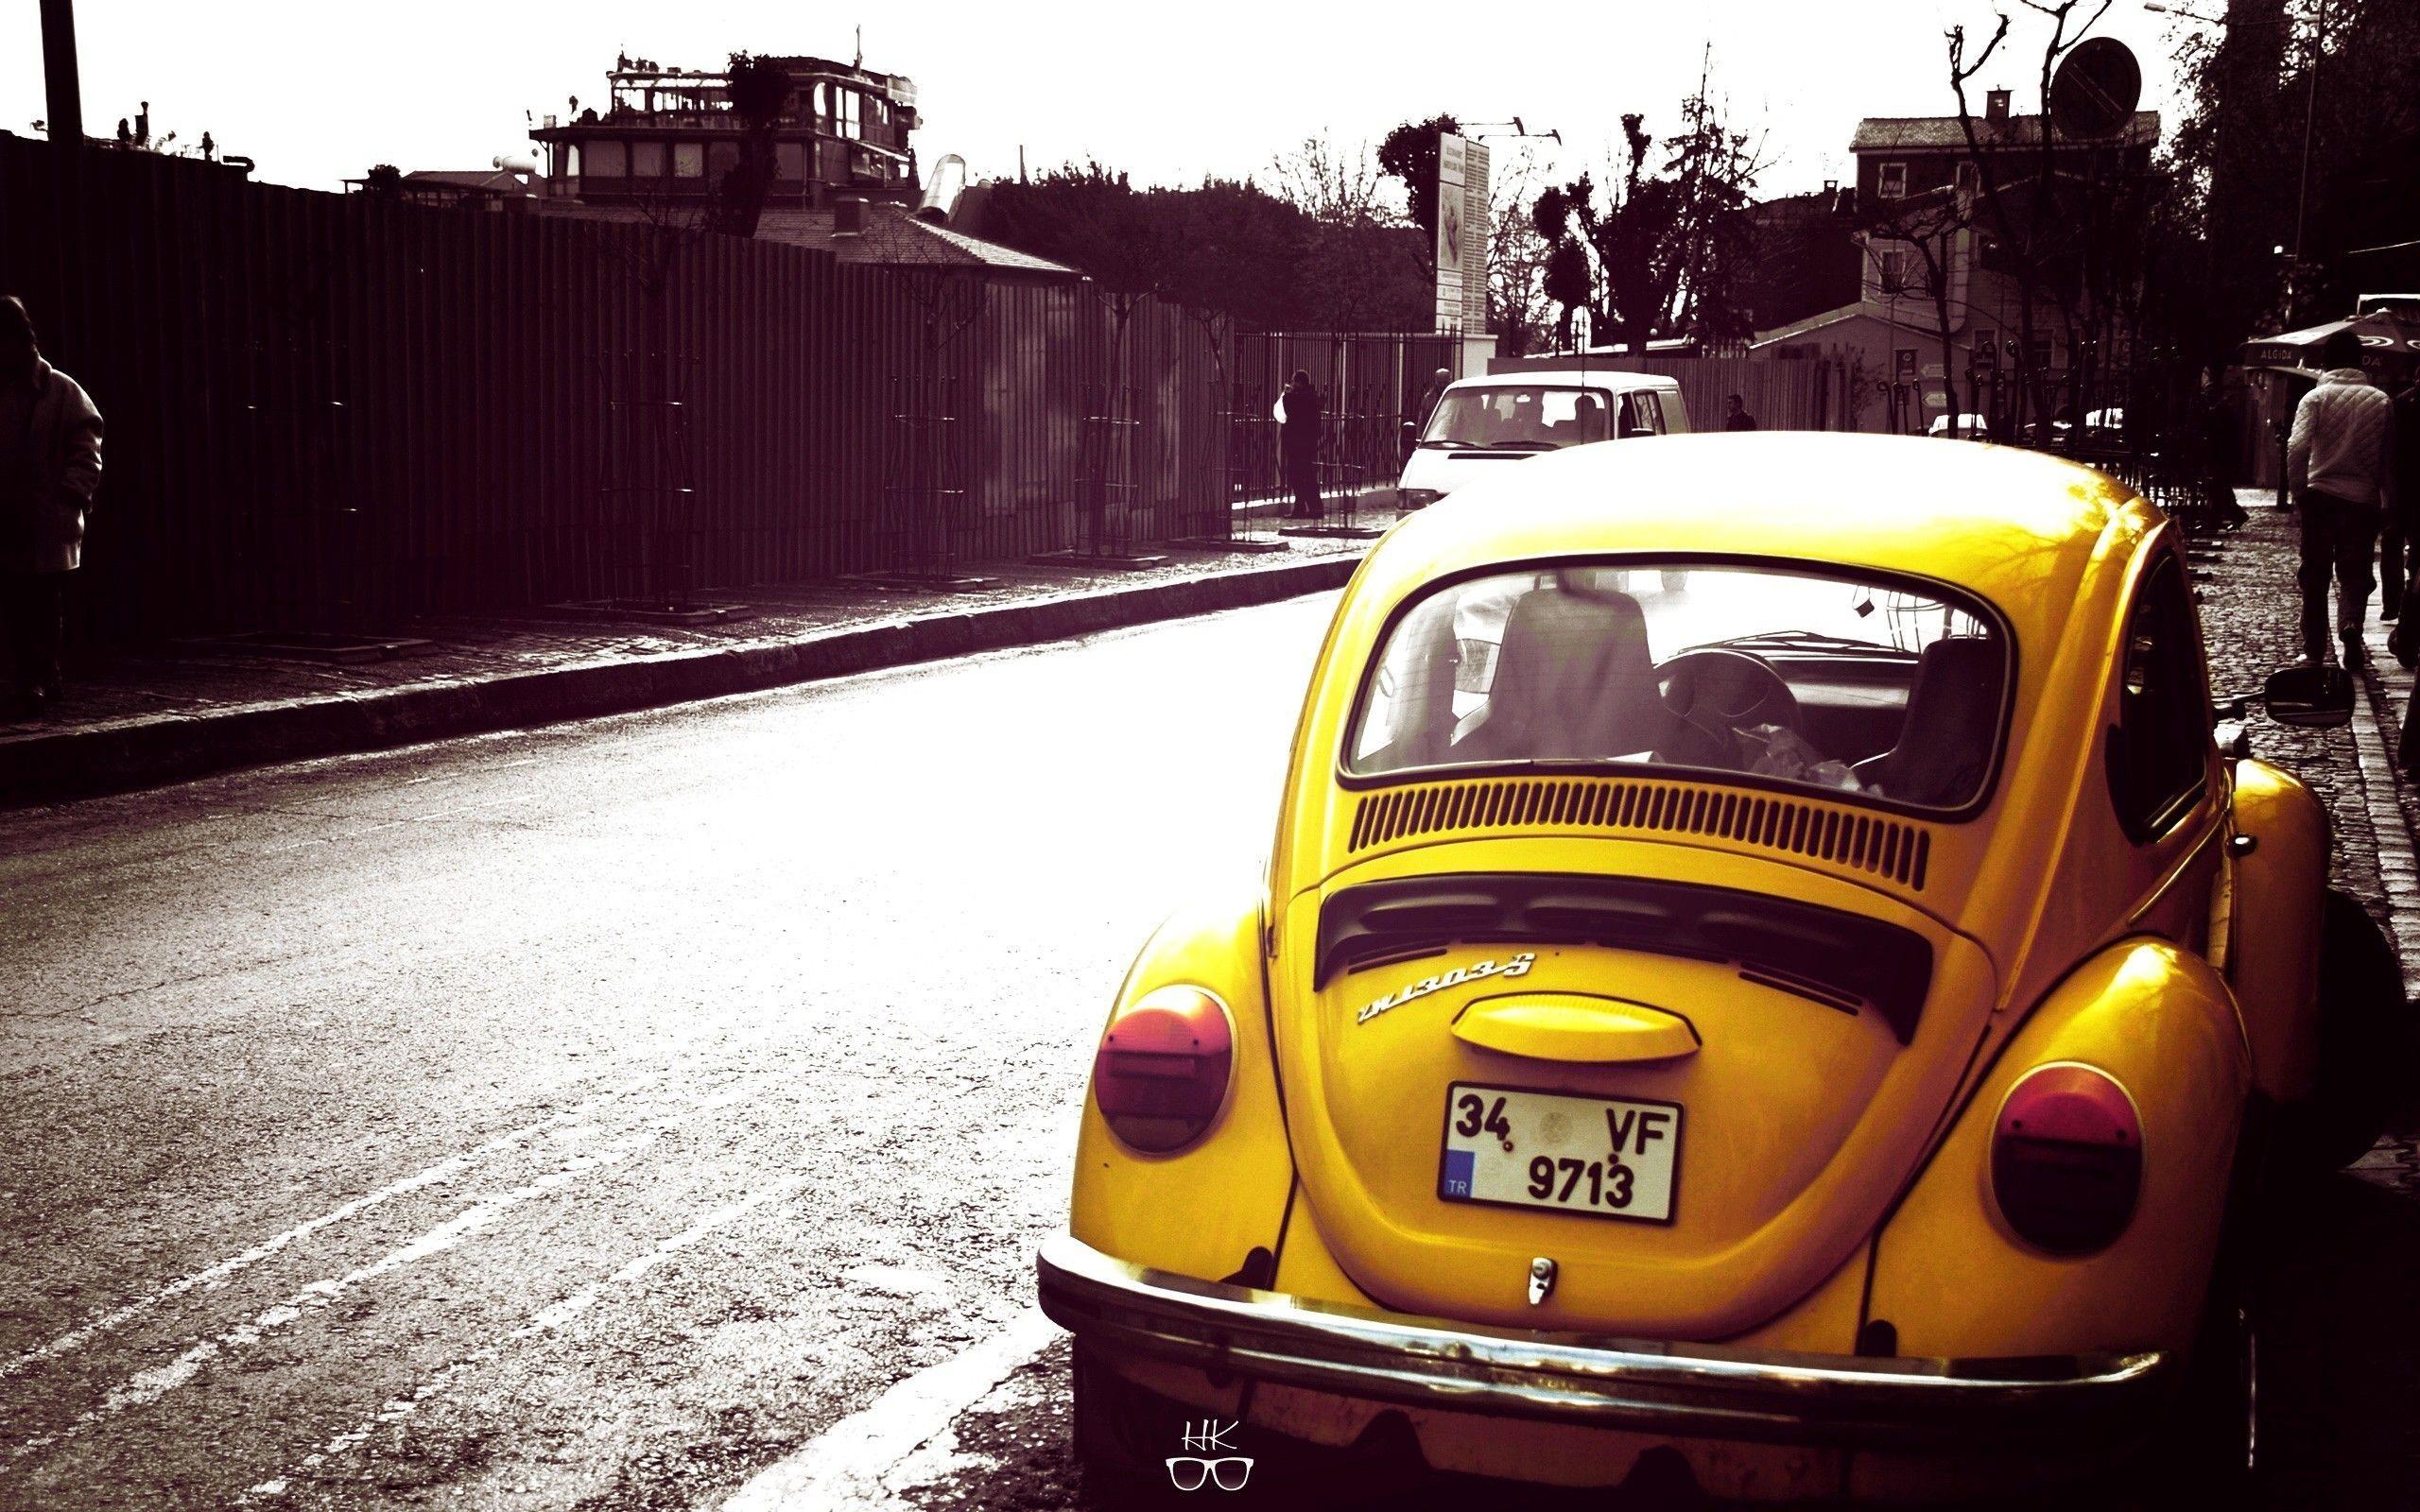 Mac Wallpapers Volkswagen Apple Wallpaper Beetle Vintage For Sale  Background…